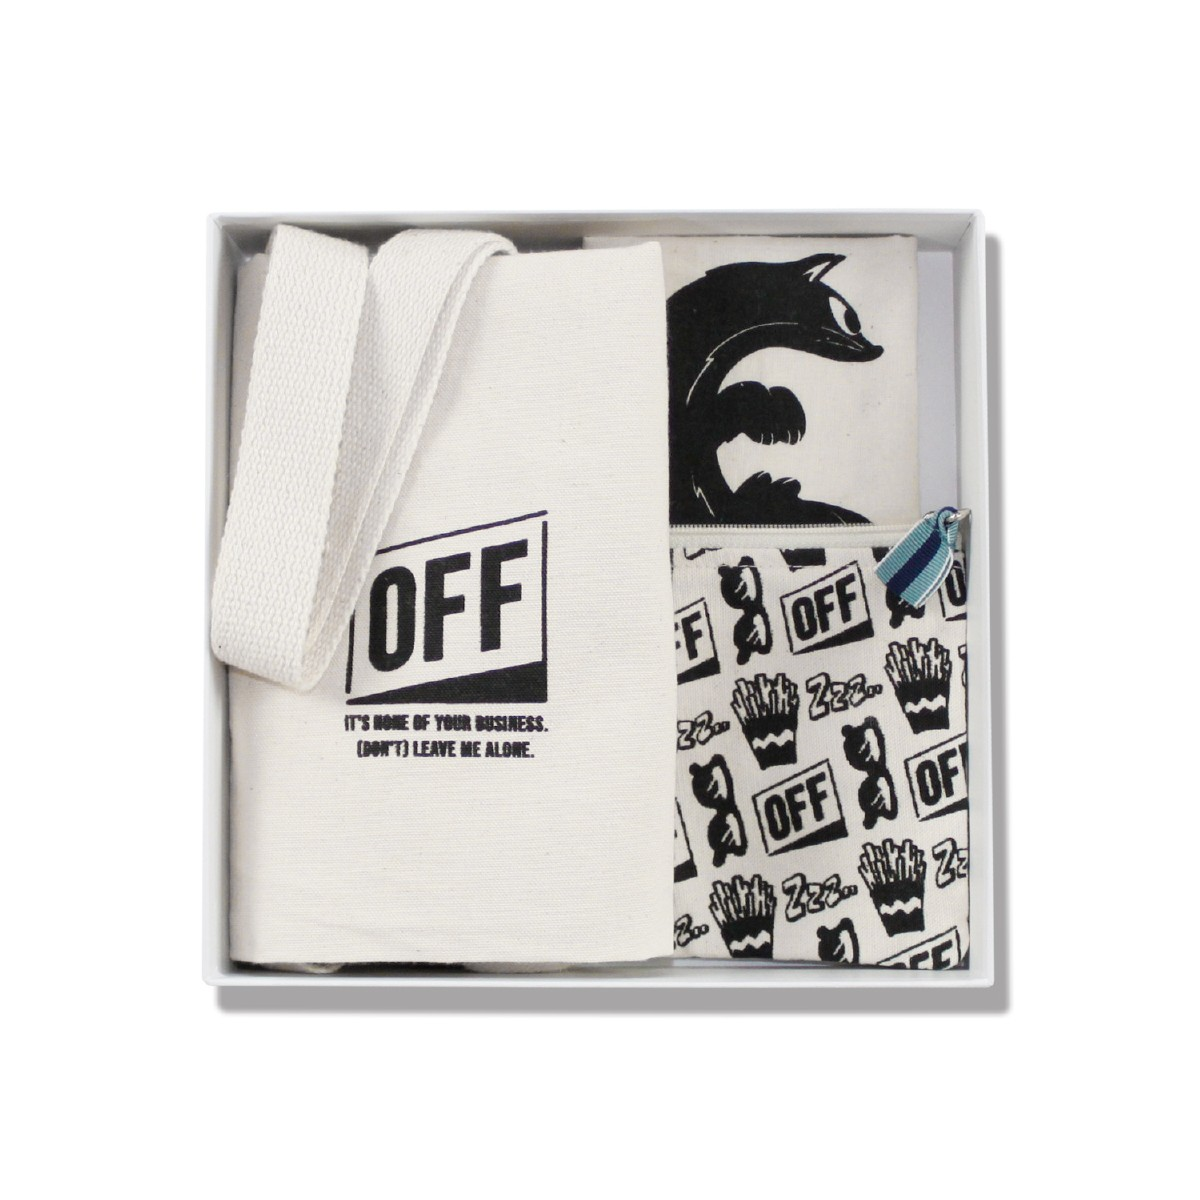 OFF オフ ギフト3点セット(巾着ポーチE/キツネtype)